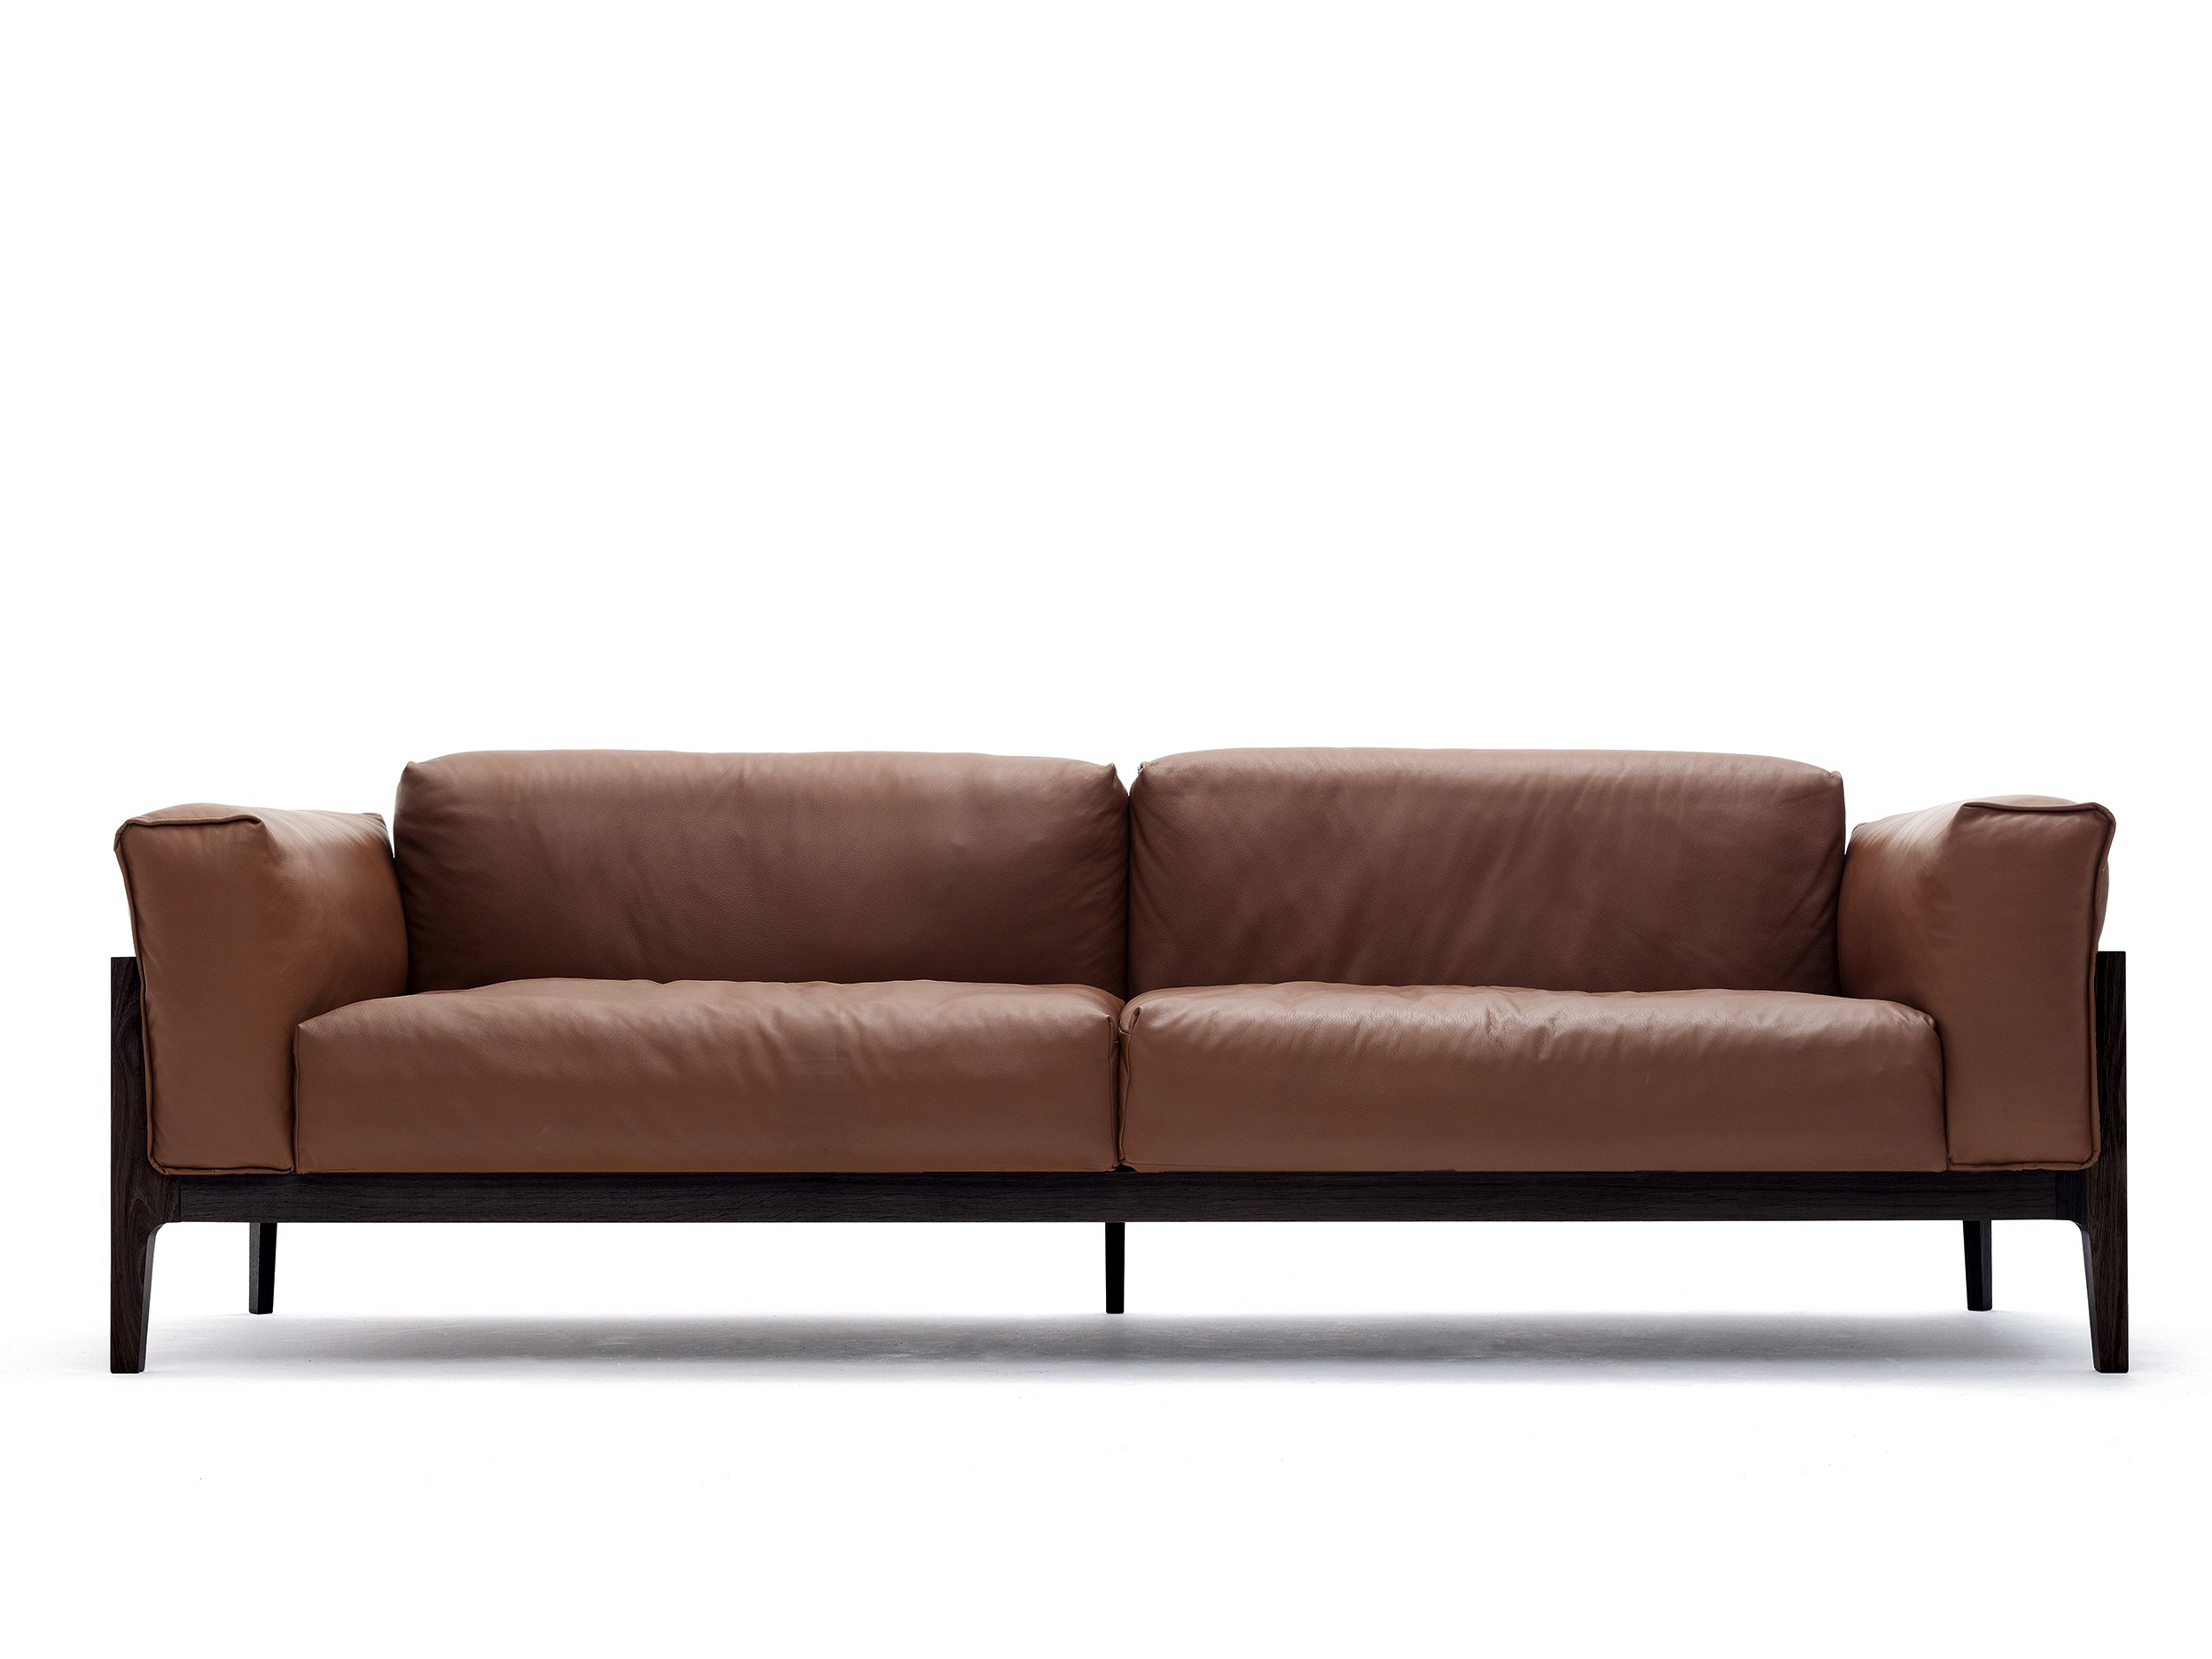 Elm corner sofa by cor design jehslaub parisarafo Choice Image